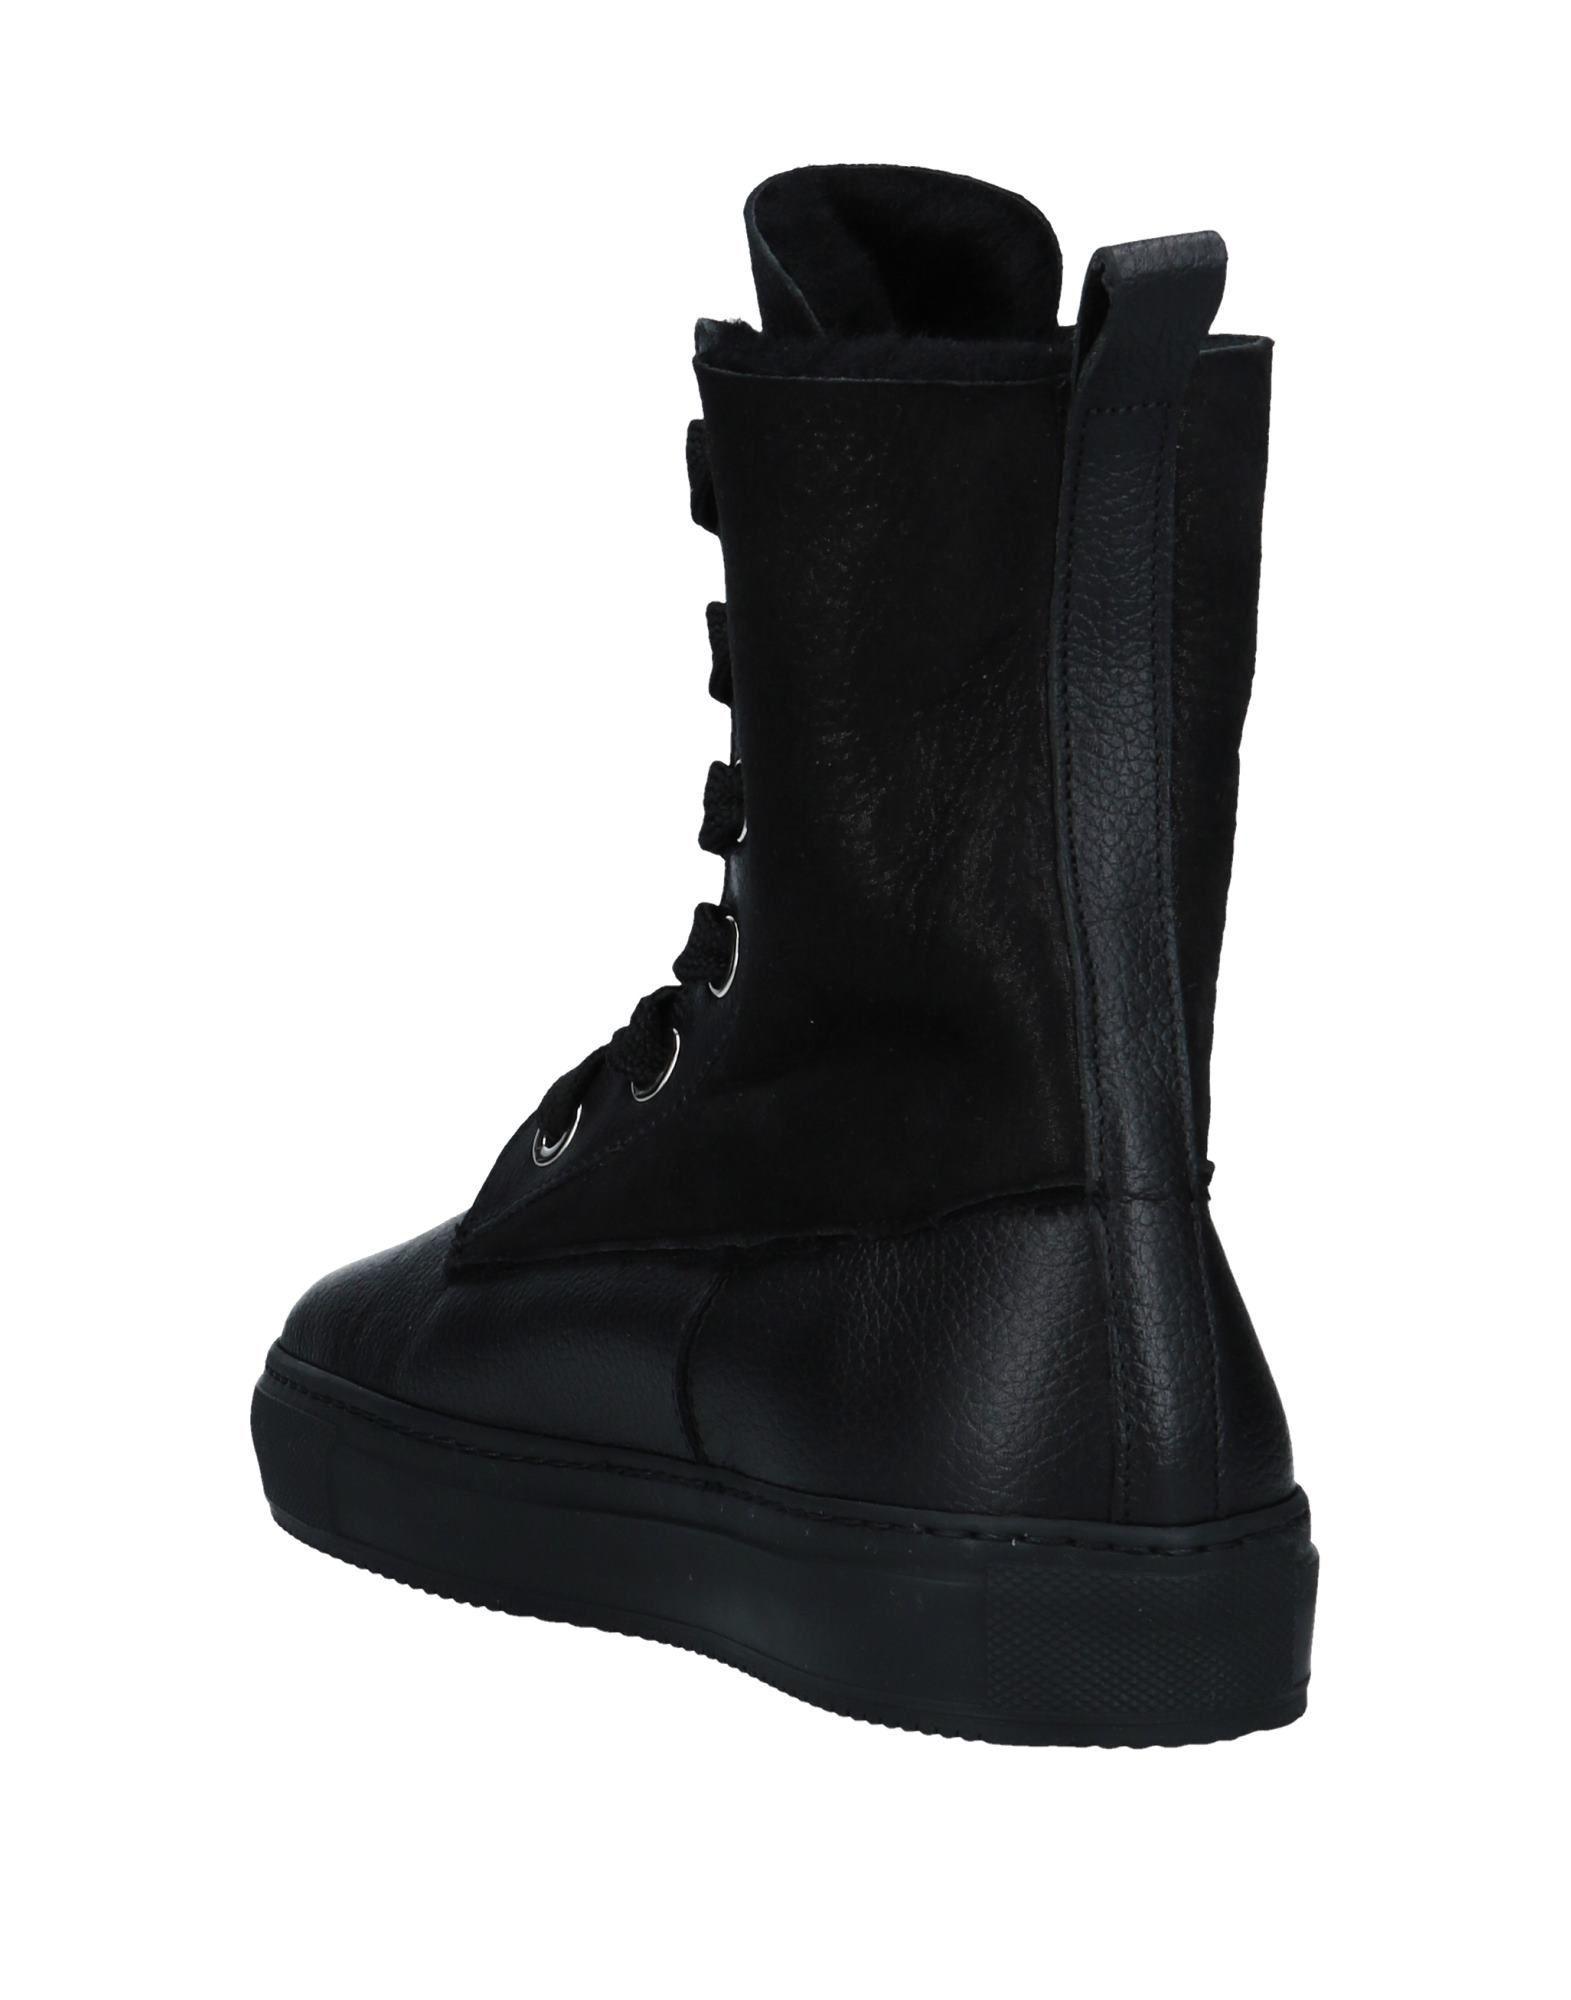 Boemos Leather High-tops & Sneakers in Black